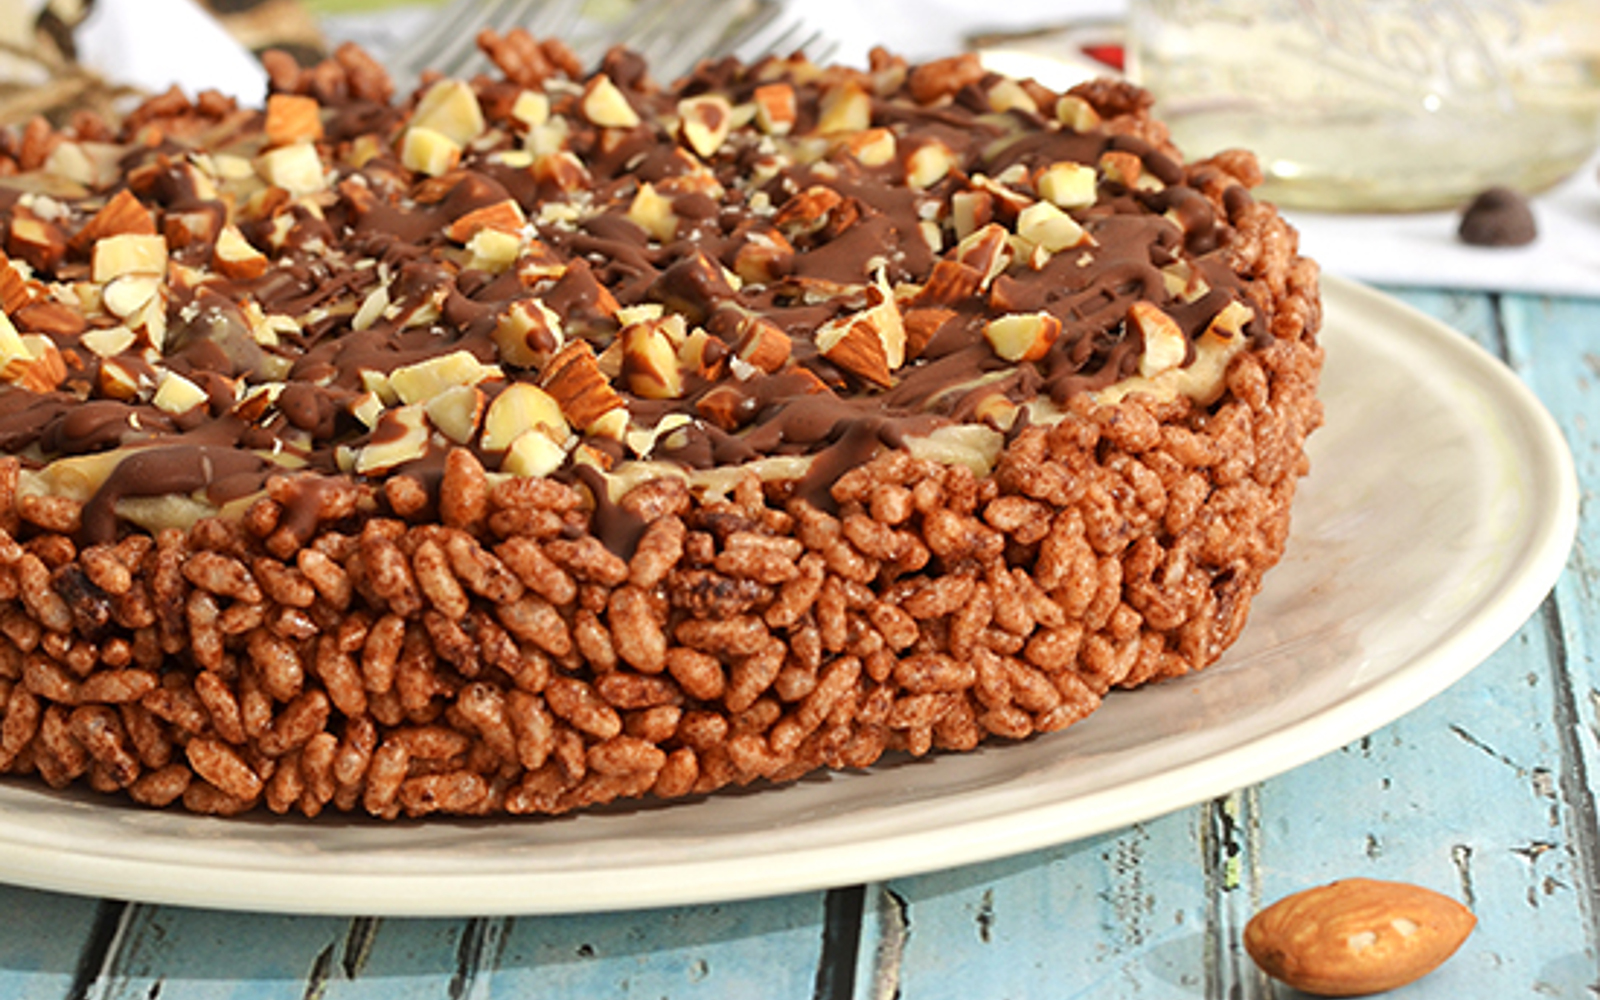 Chocolate Banana Peanut Butter Ice Cream Cake